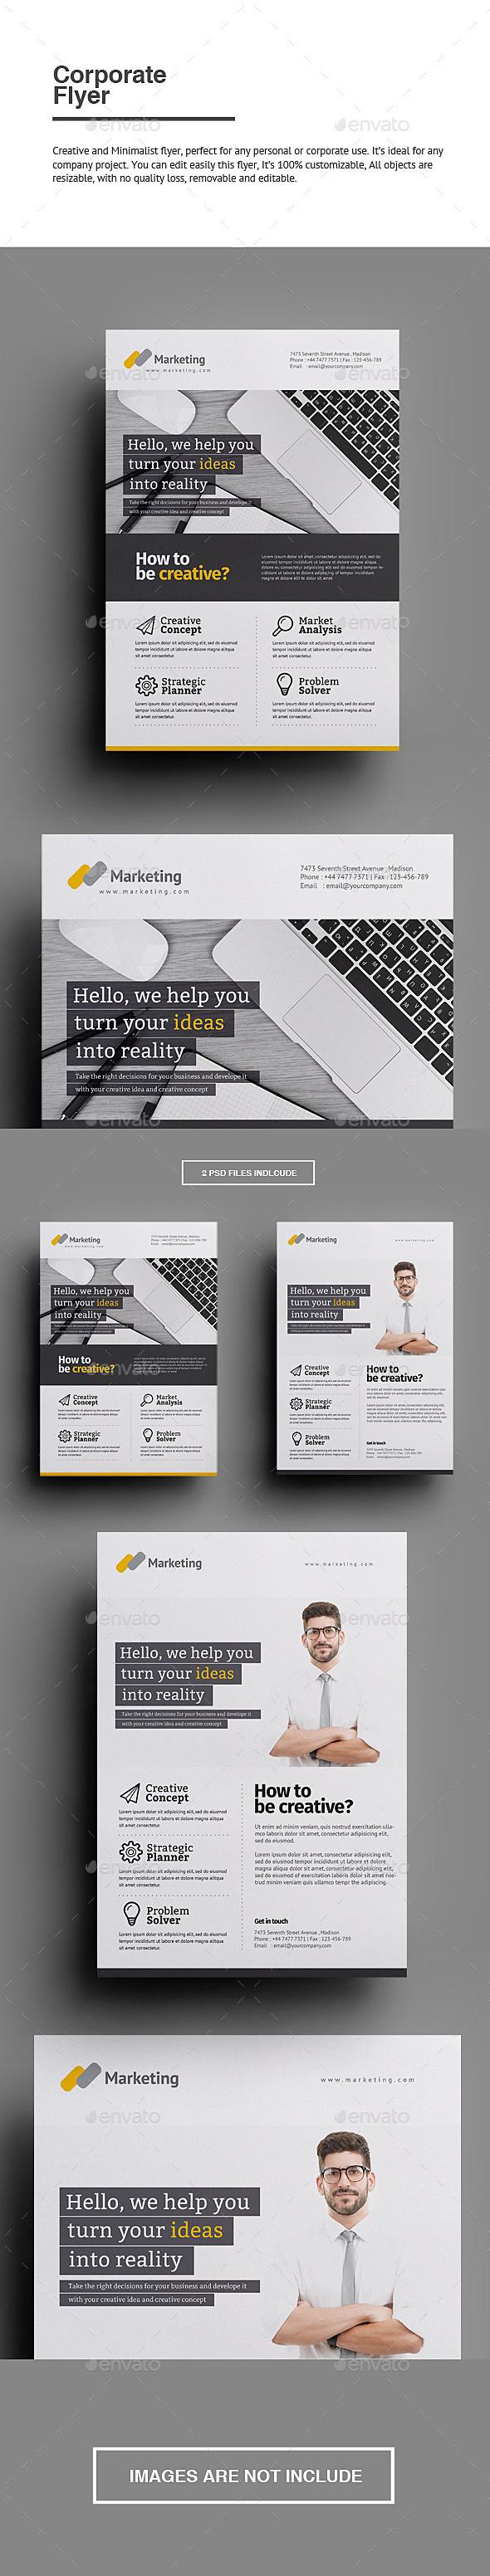 Graphicriver-Corporate-Flyer-10031785